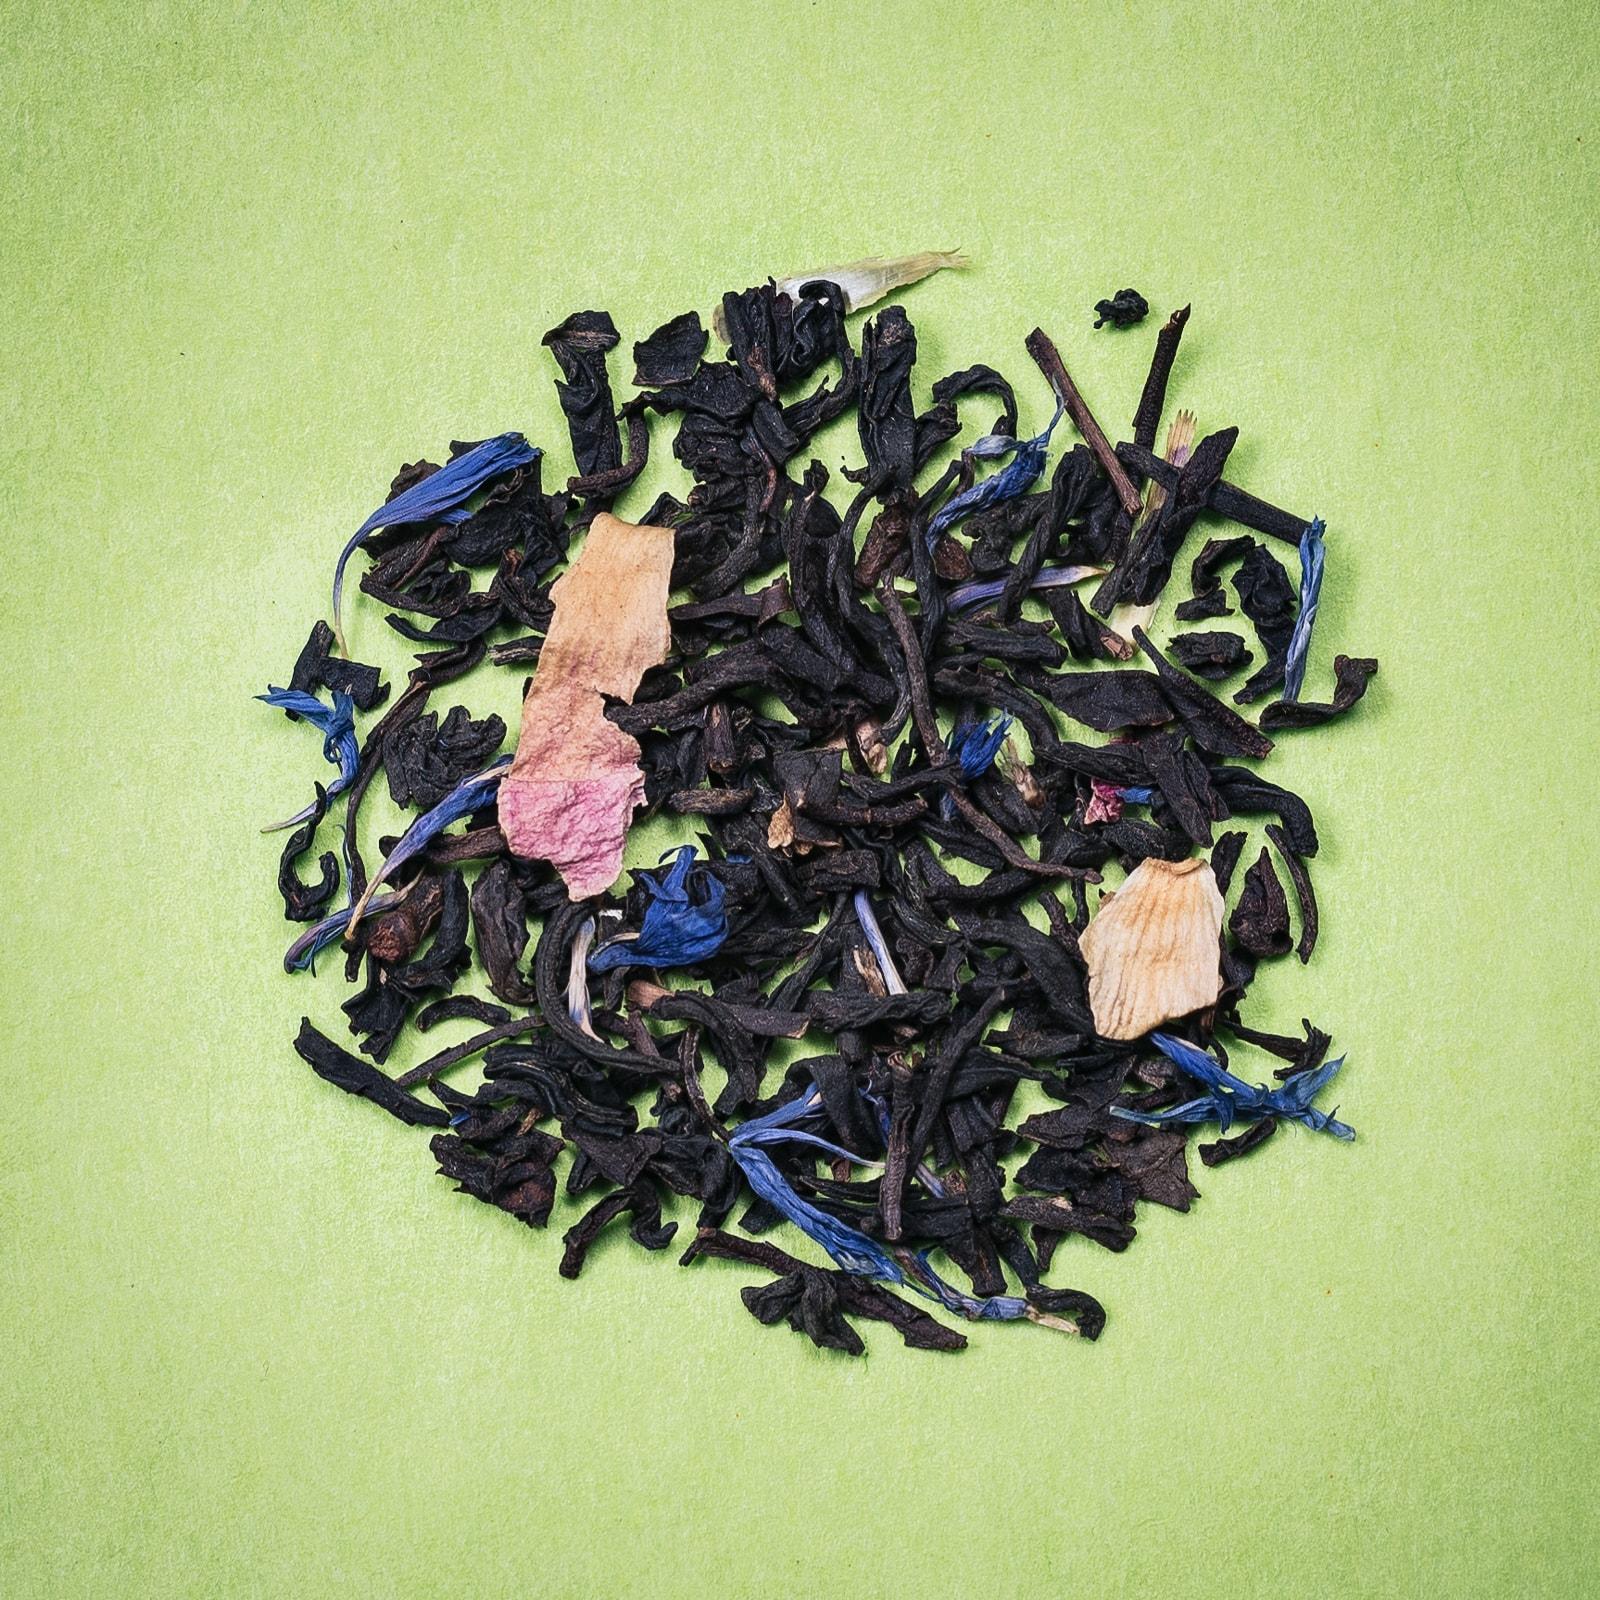 Anbassa-artisan-torrefacteur-the-noir-aromatise-Coquelicot-GUP